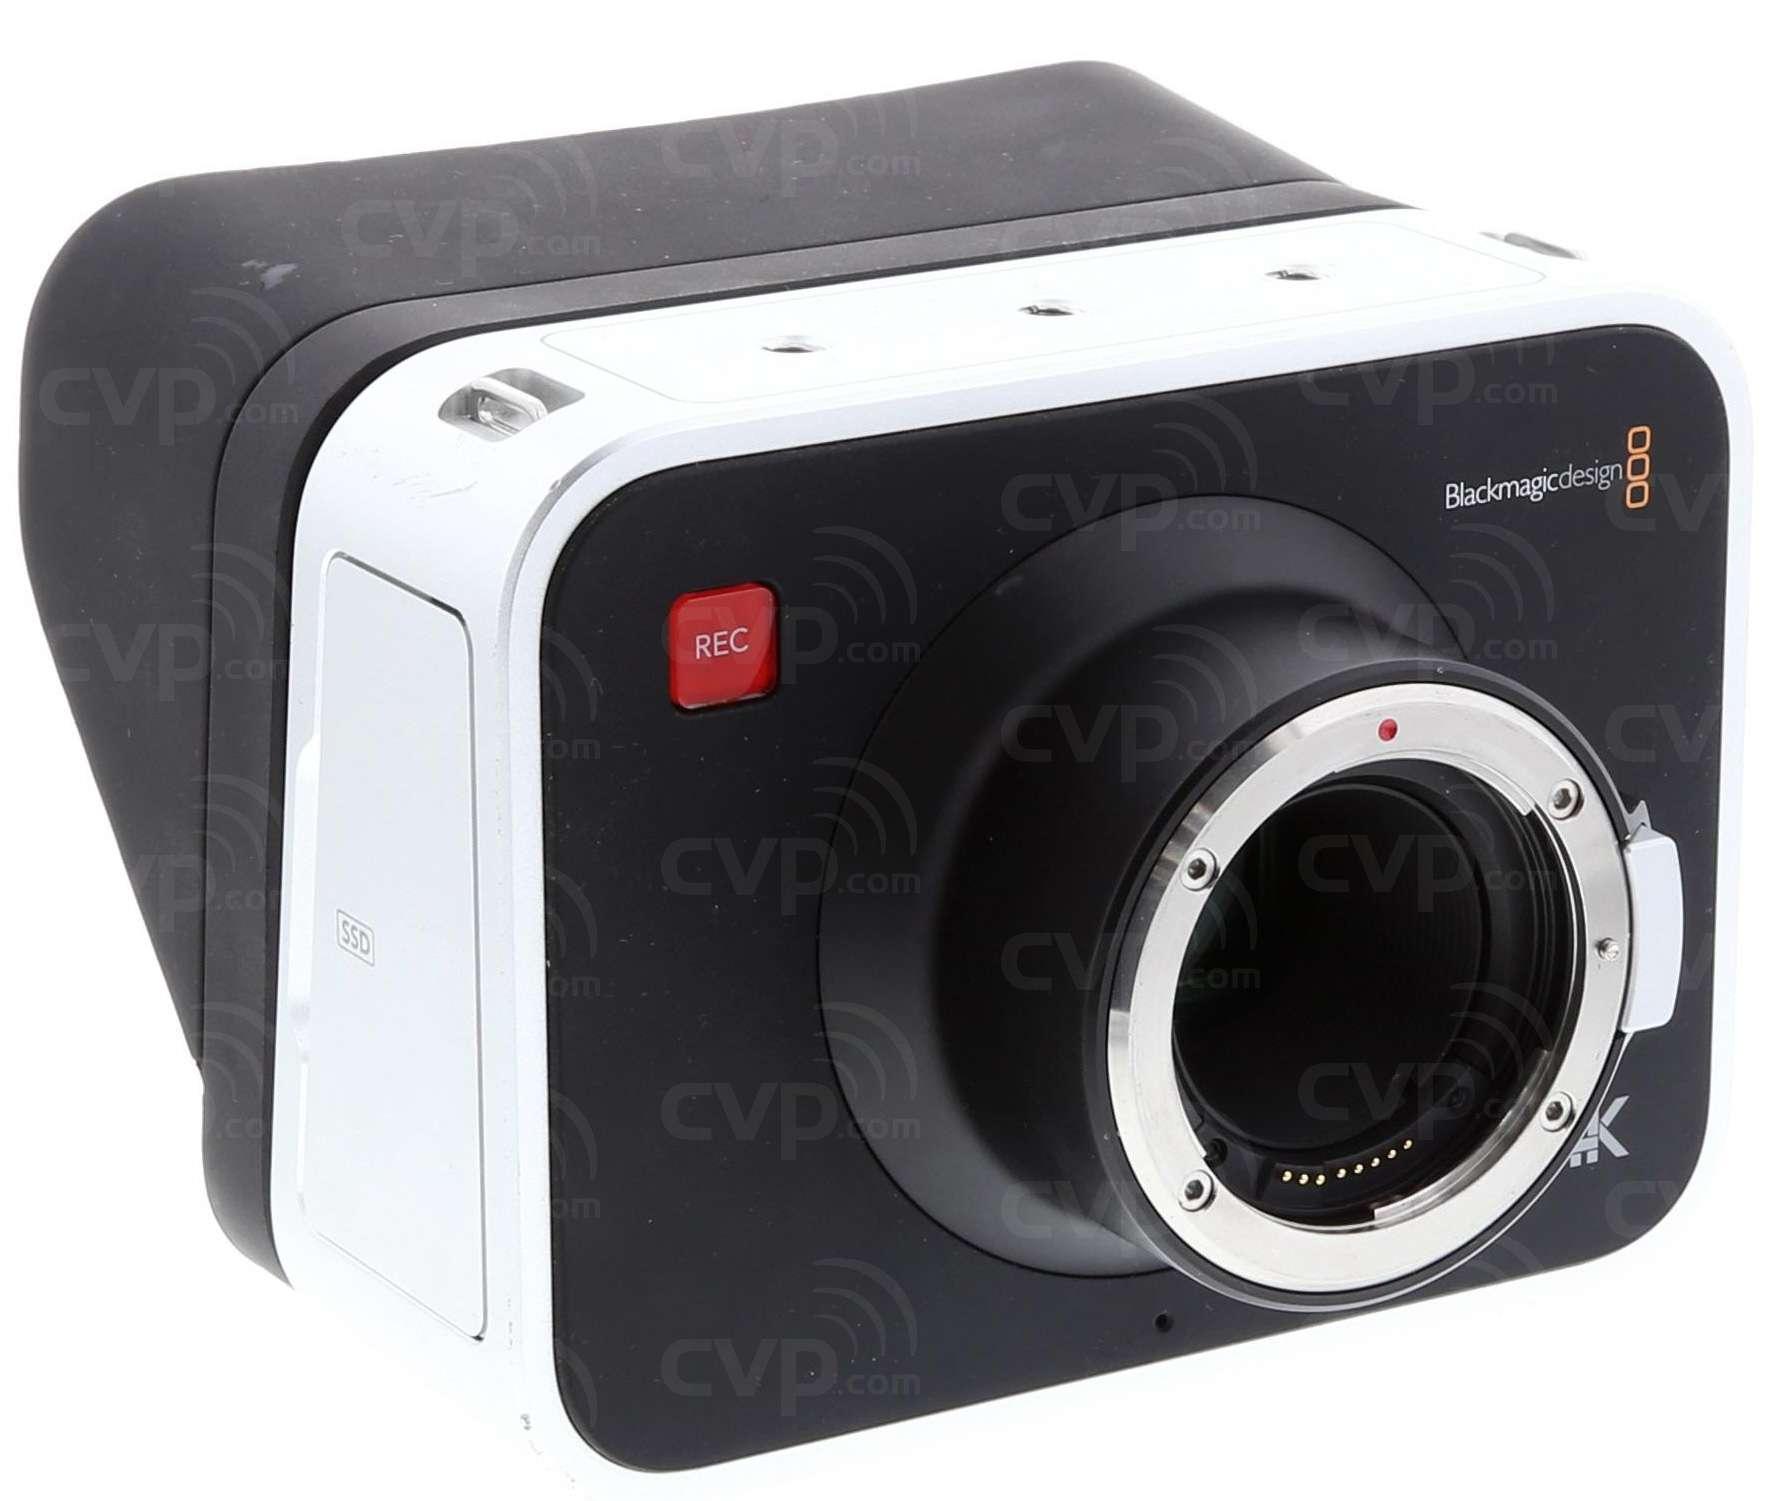 Buy Pre Owned Blackmagic Design Production Camera 4k Super 35mm Cinema Ef Mount Body Only 1750443